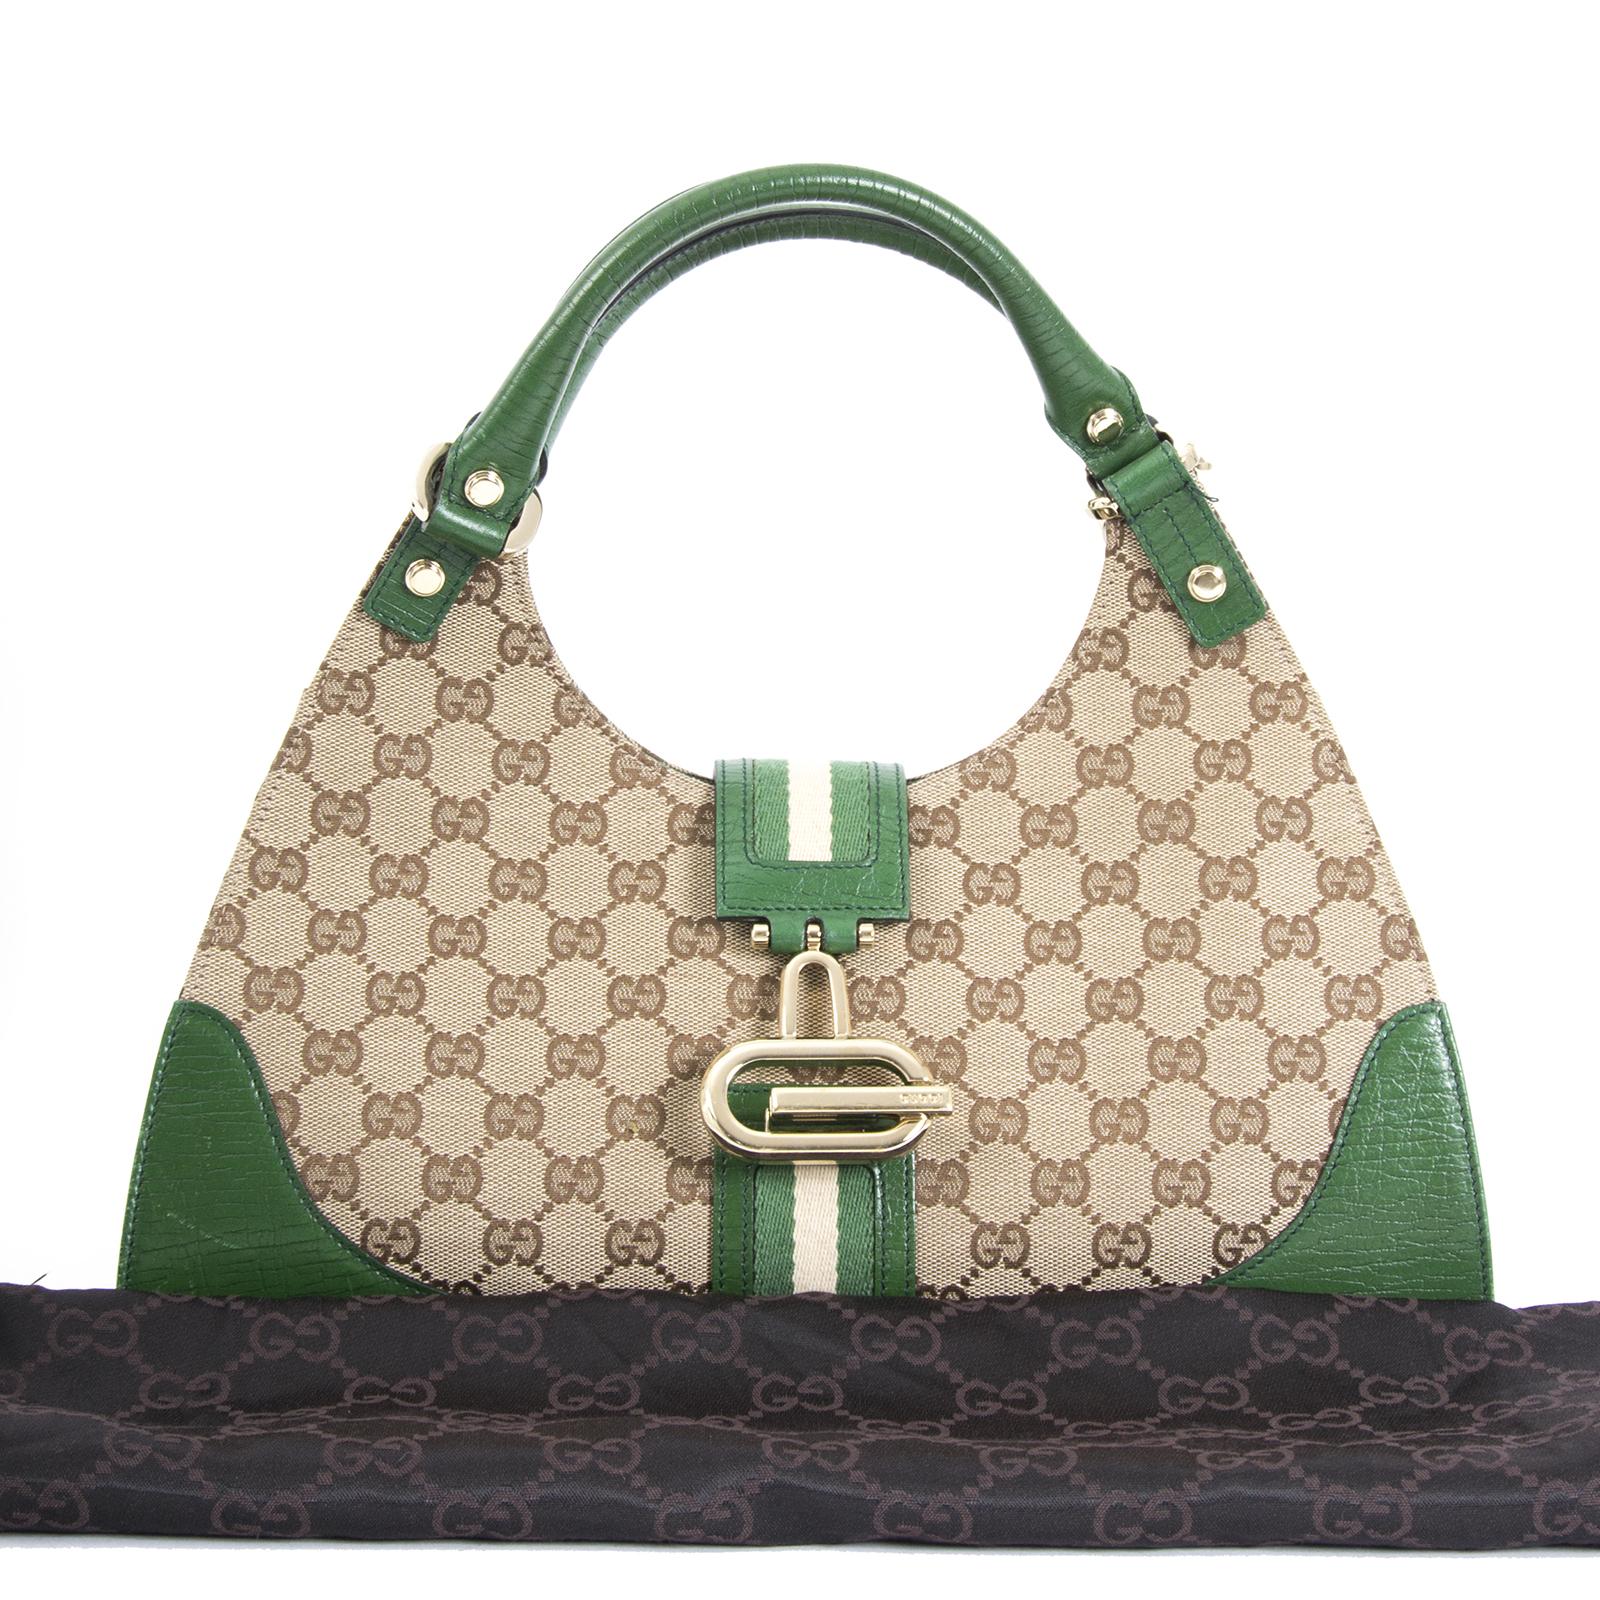 ea08ff45ab2 Gucci Monogram Green Top Handle Bag Gucci Monogram Green Top Handle Bag